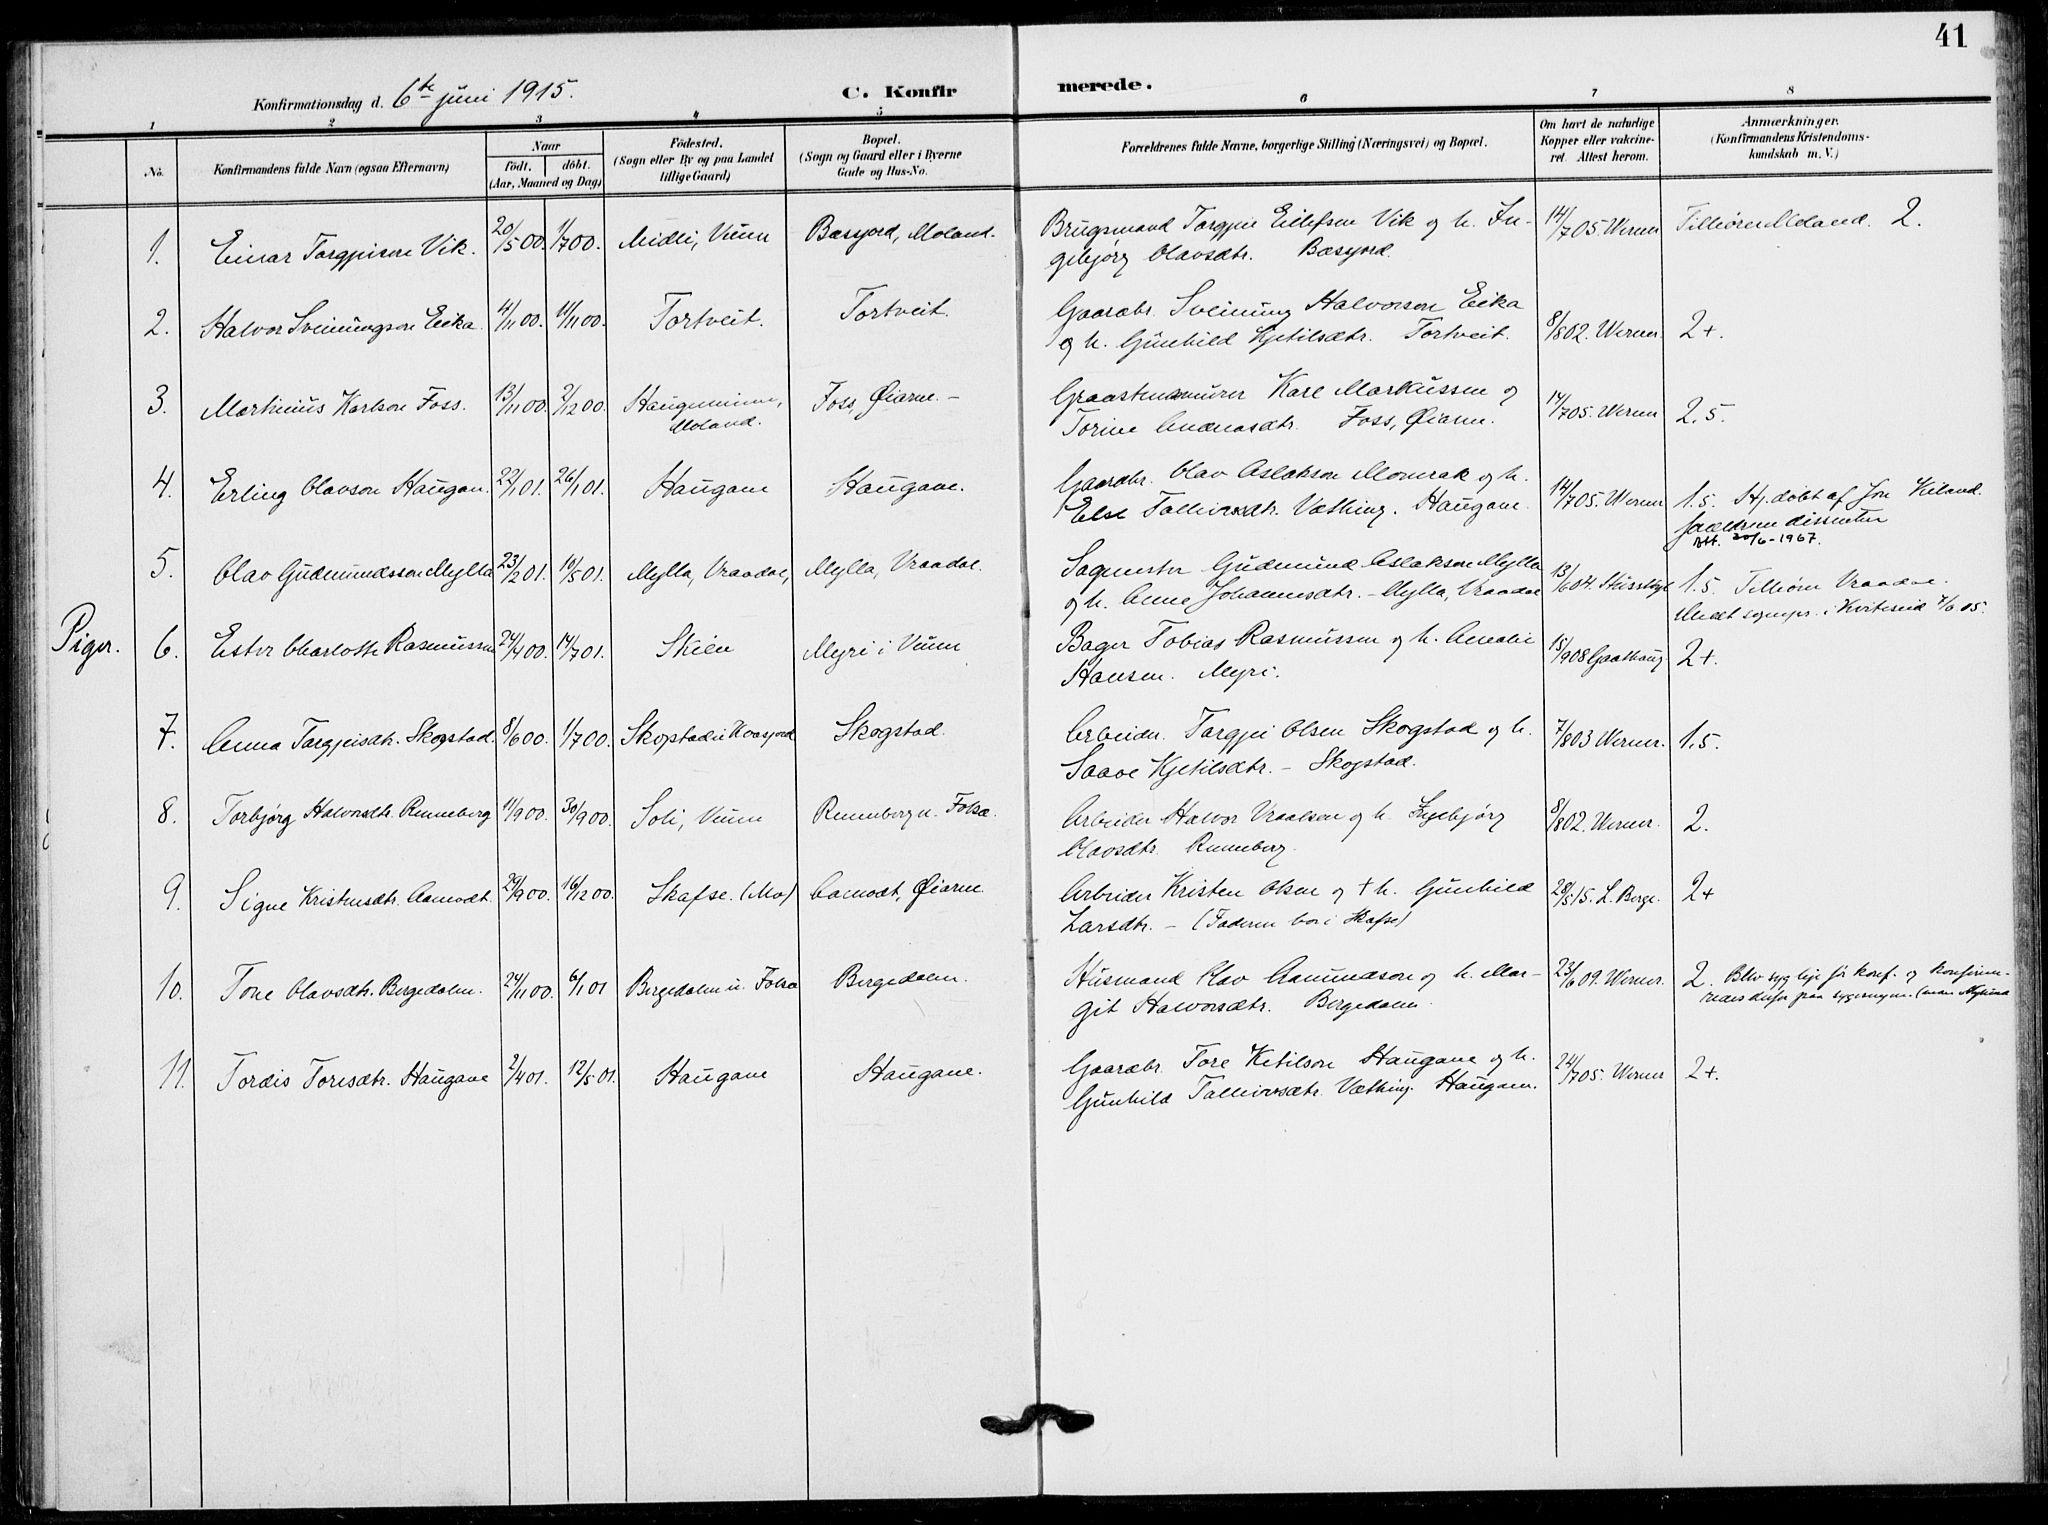 SAKO, Fyresdal kirkebøker, F/Fb/L0004: Ministerialbok nr. II 4, 1903-1920, s. 41